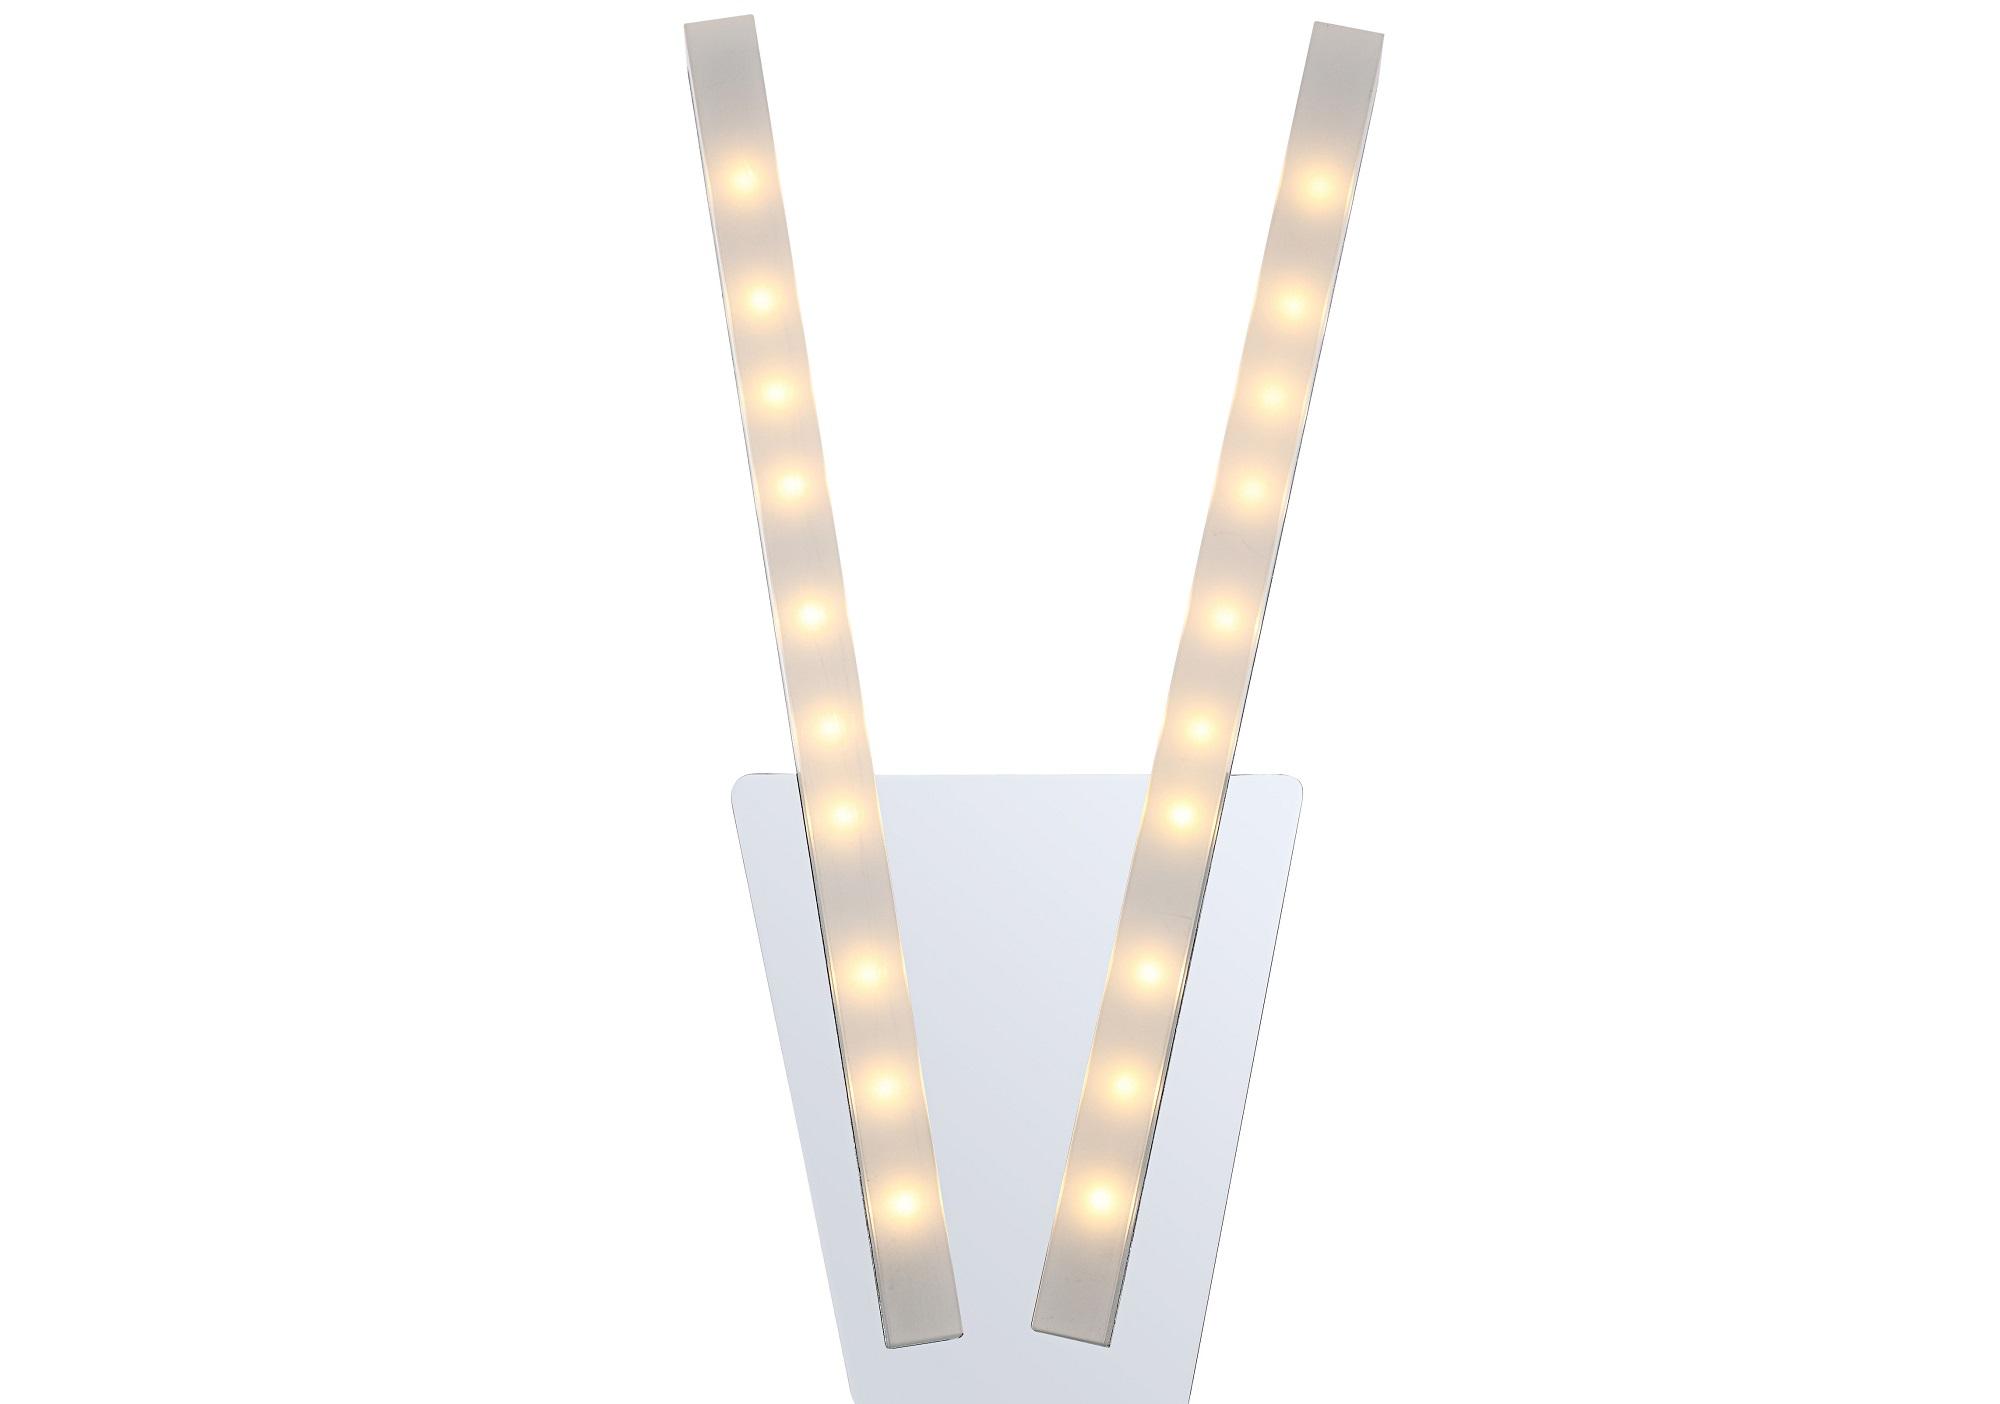 Светильник настенныйБра<br>&amp;lt;div&amp;gt;Вид цоколя: LED&amp;lt;/div&amp;gt;&amp;lt;div&amp;gt;Мощность: 5W&amp;lt;/div&amp;gt;&amp;lt;div&amp;gt;Количество ламп: 2&amp;lt;/div&amp;gt;&amp;lt;div&amp;gt;&amp;lt;br&amp;gt;&amp;lt;/div&amp;gt;&amp;lt;div&amp;gt;Материал: металл, акрил&amp;lt;/div&amp;gt;<br><br>Material: Металл<br>Width см: 19<br>Height см: 36